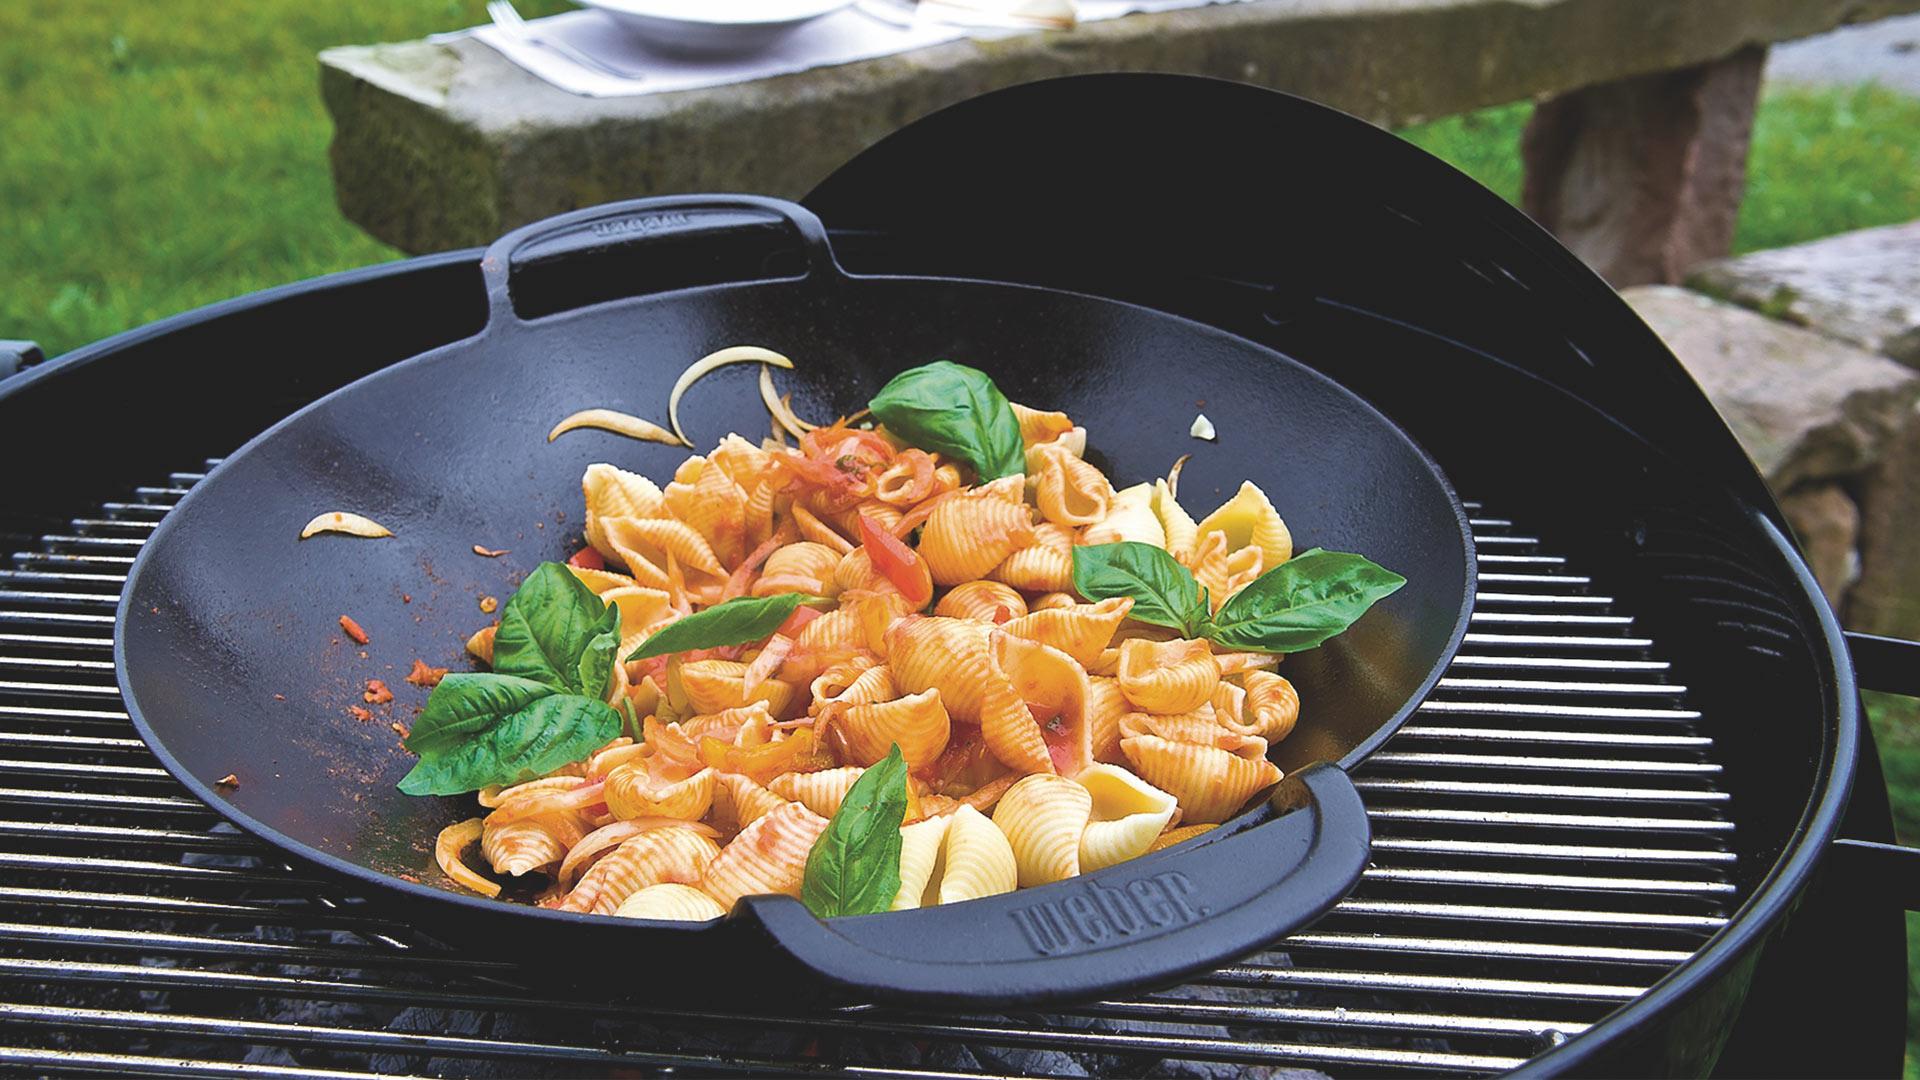 Flammkuchen Weber Holzkohlegrill : Basic weber grill academy